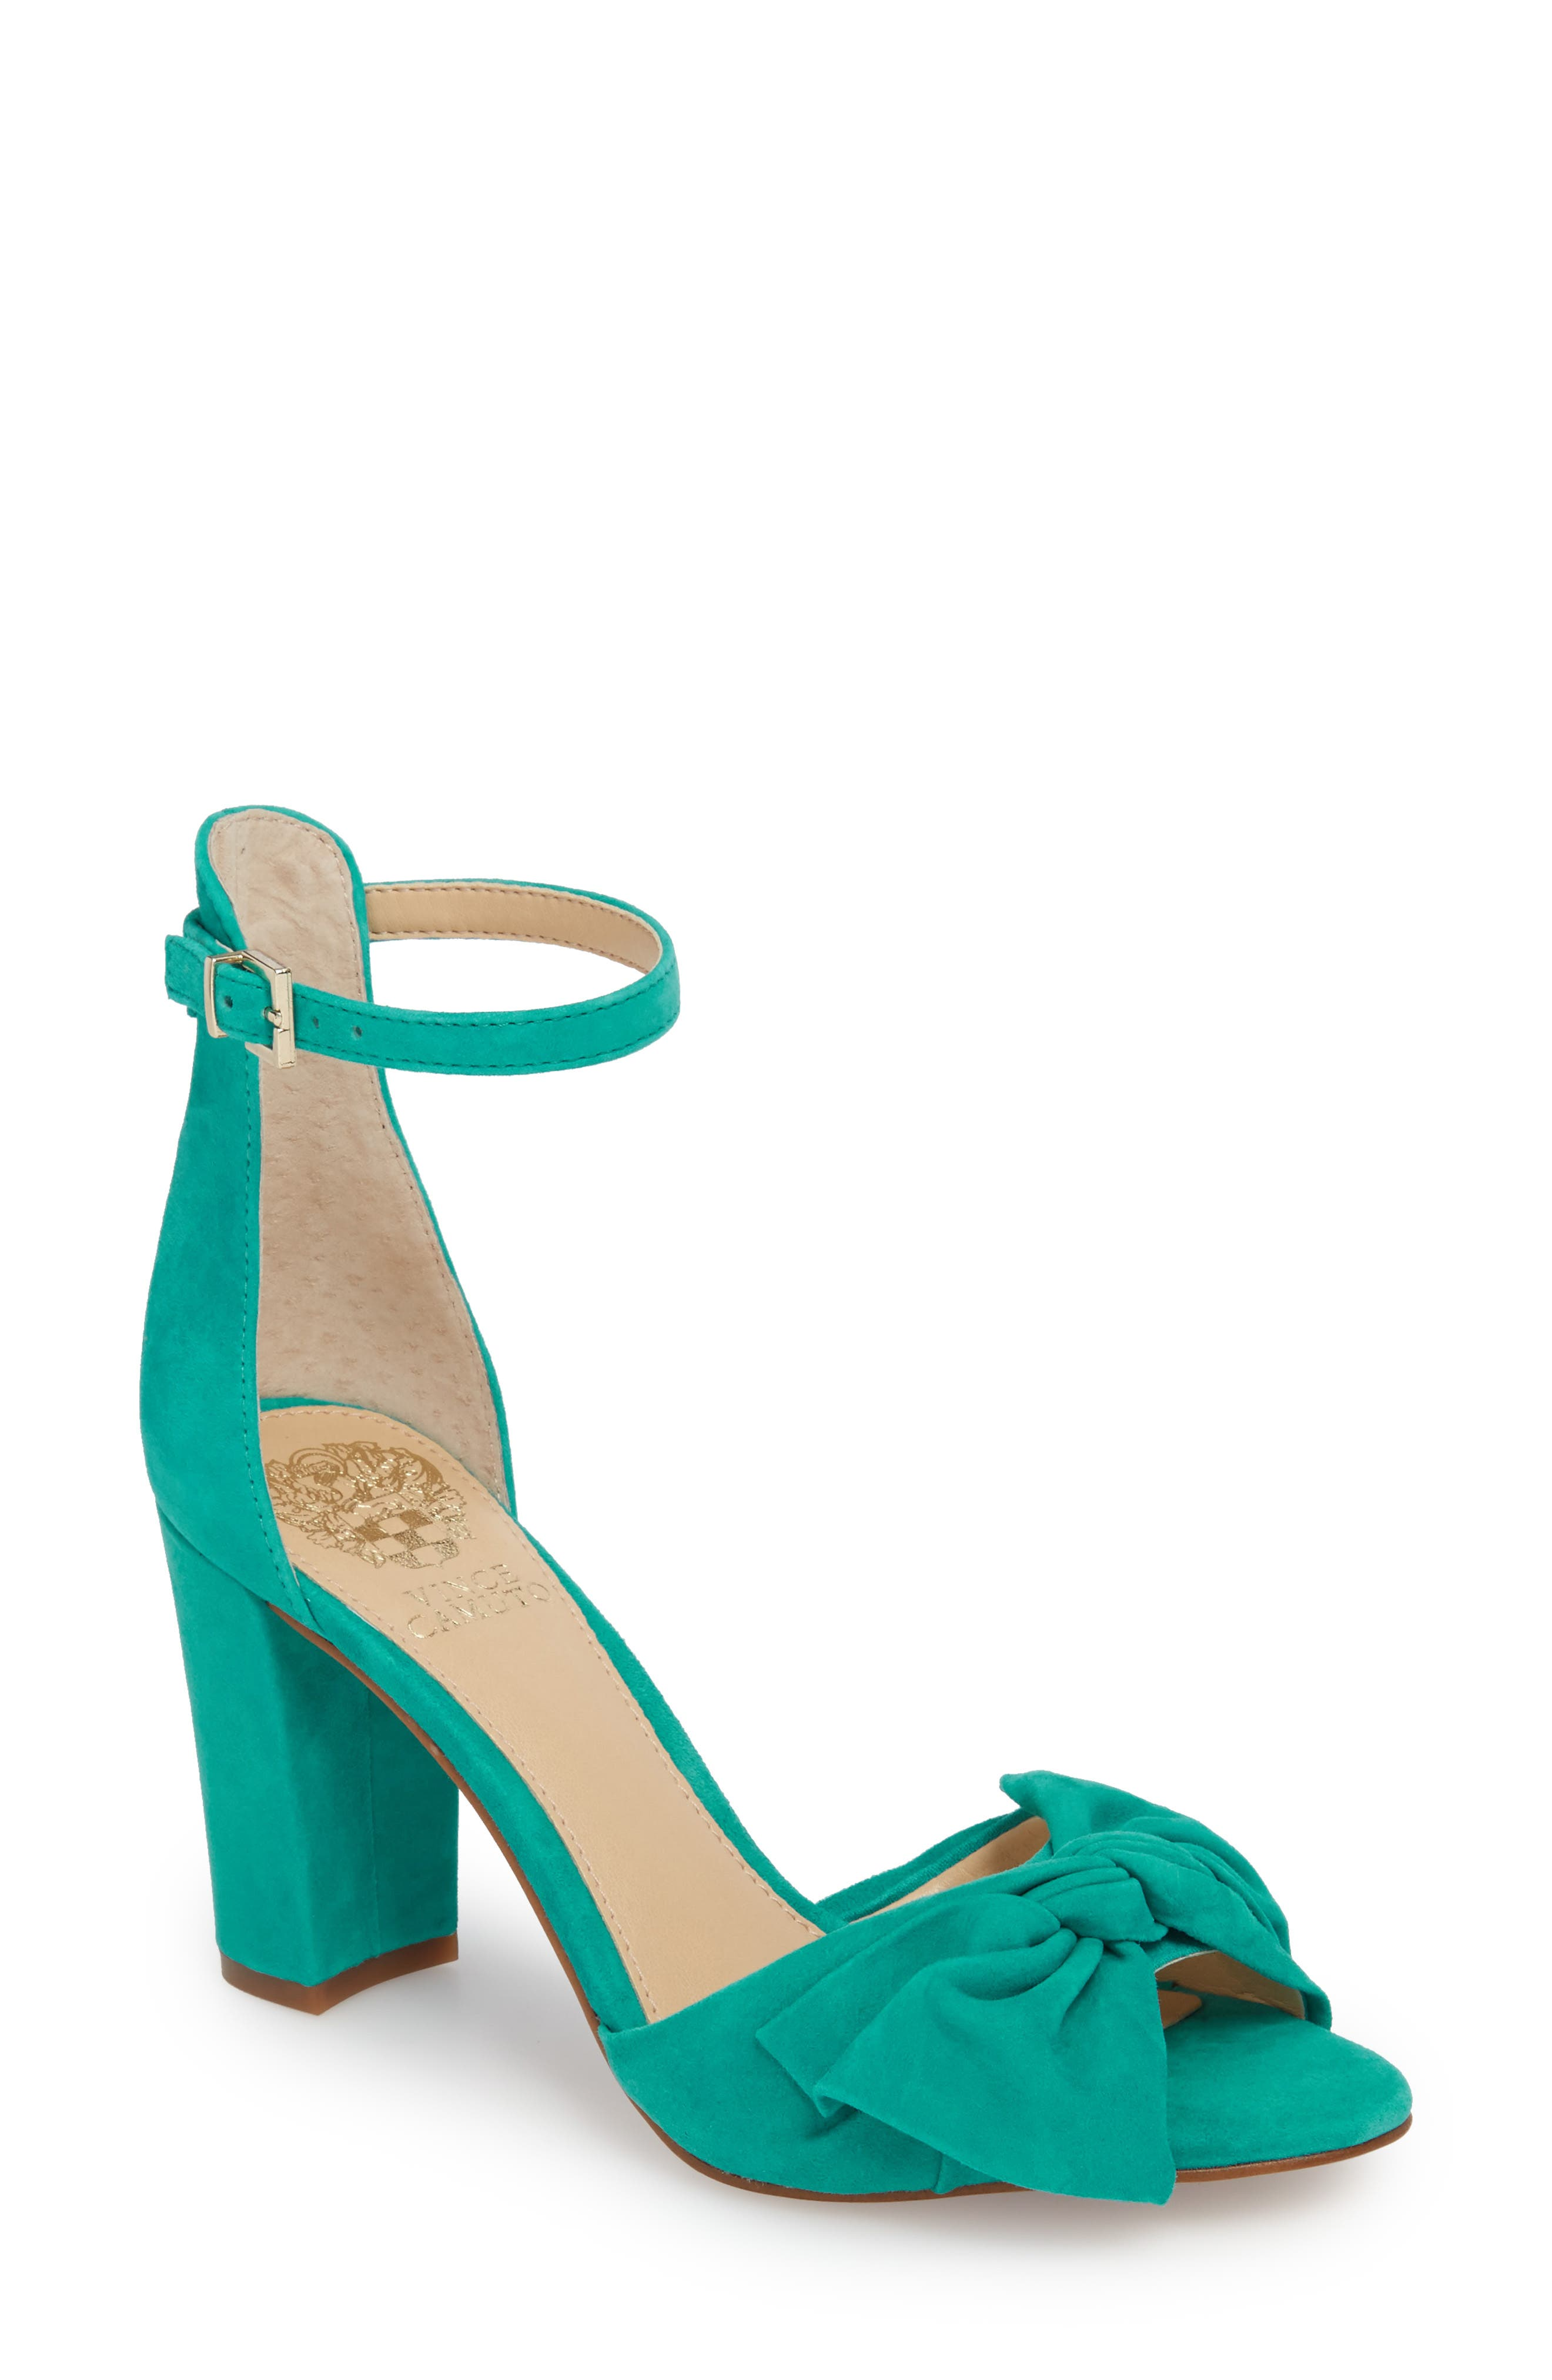 Carrelen Block Heel Sandal,                             Main thumbnail 2, color,